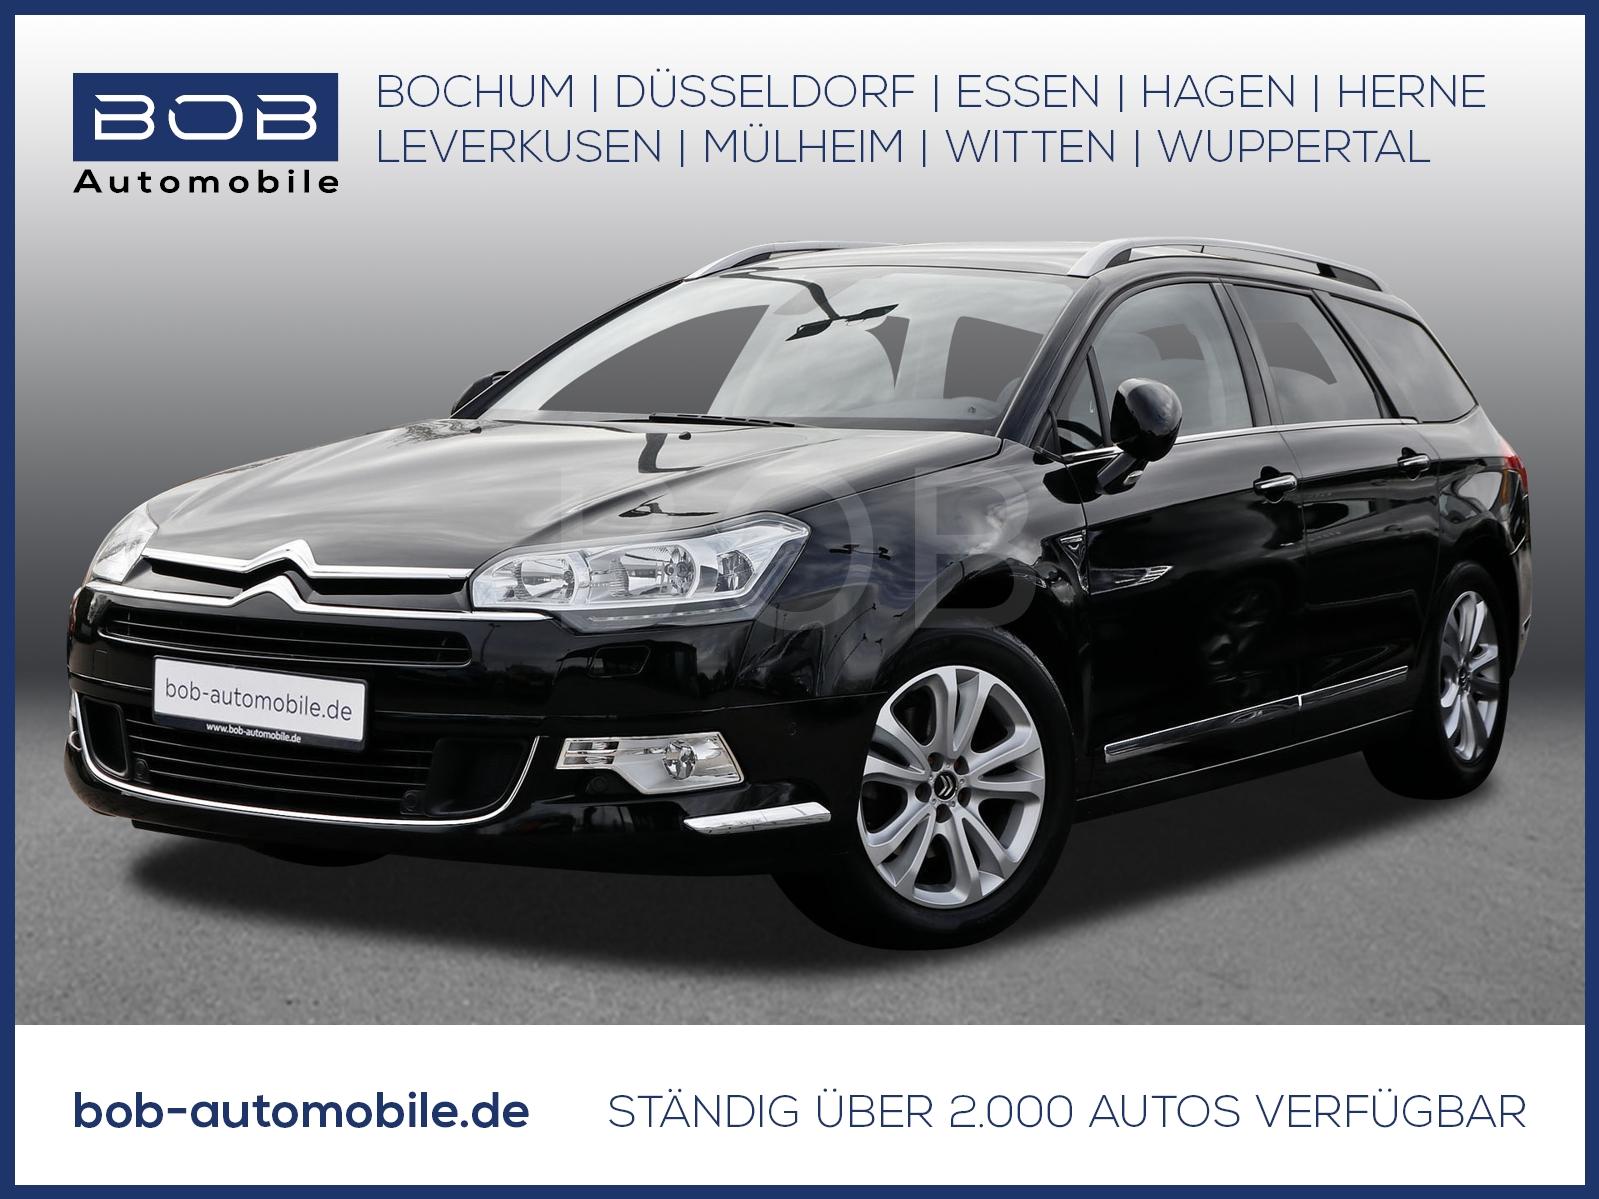 Citroën C5 2.0 HDi Exclusive NAVI SHZ PDC KLIMA PANO LM, Jahr 2014, Diesel